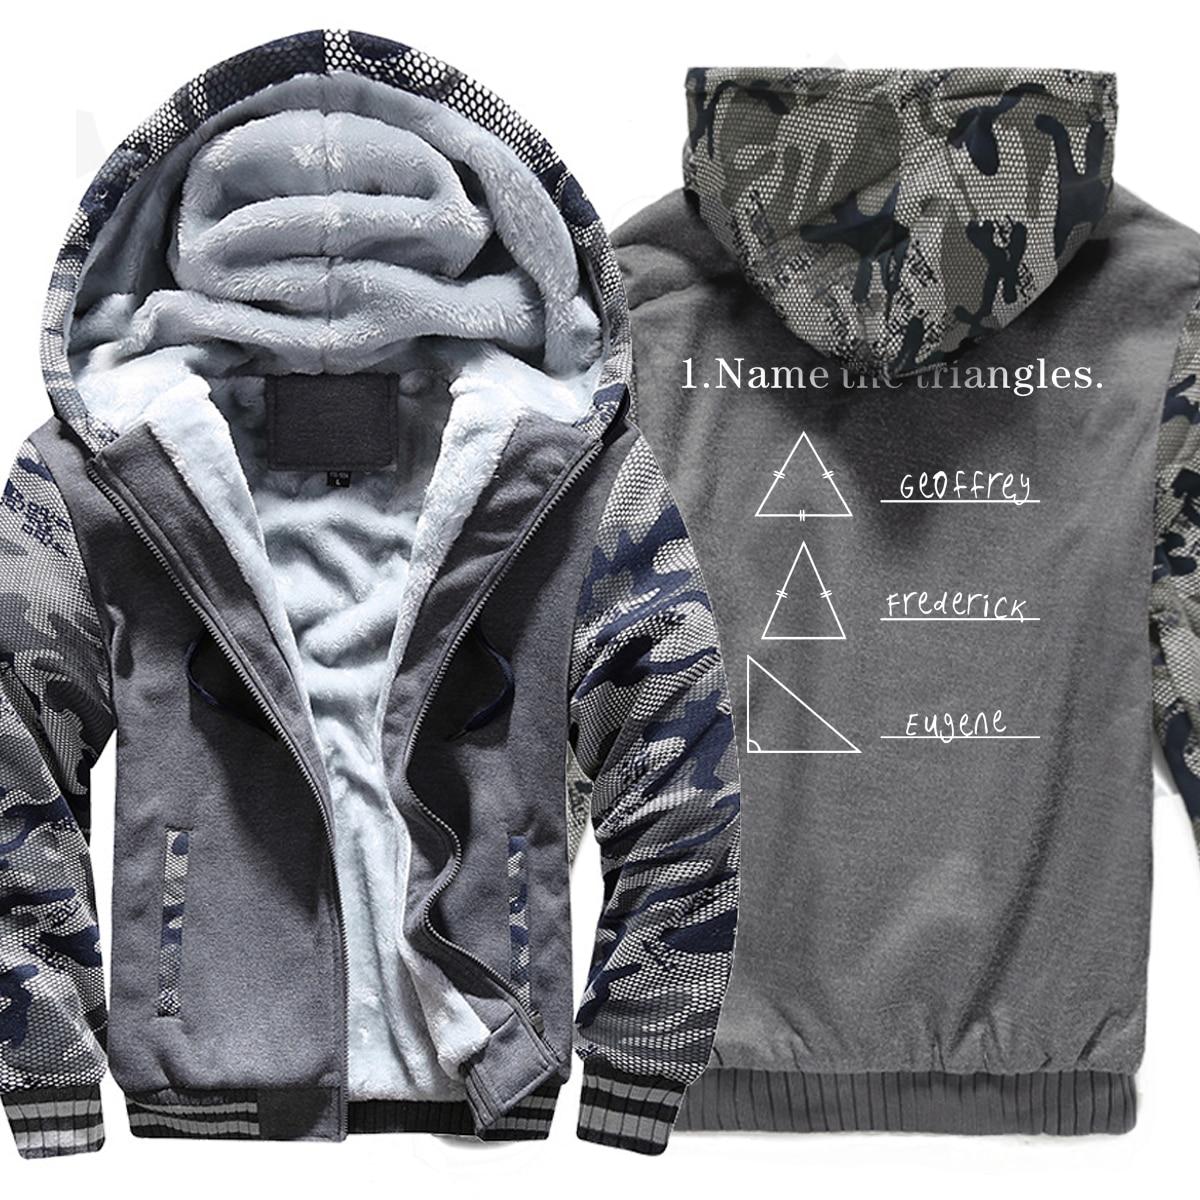 2019 New Fashion Streetwear Hoodies Male Print Name The Triangles Funny Hoody Thick Sweatshrit Men's Sportswear Hip Hop Jackets